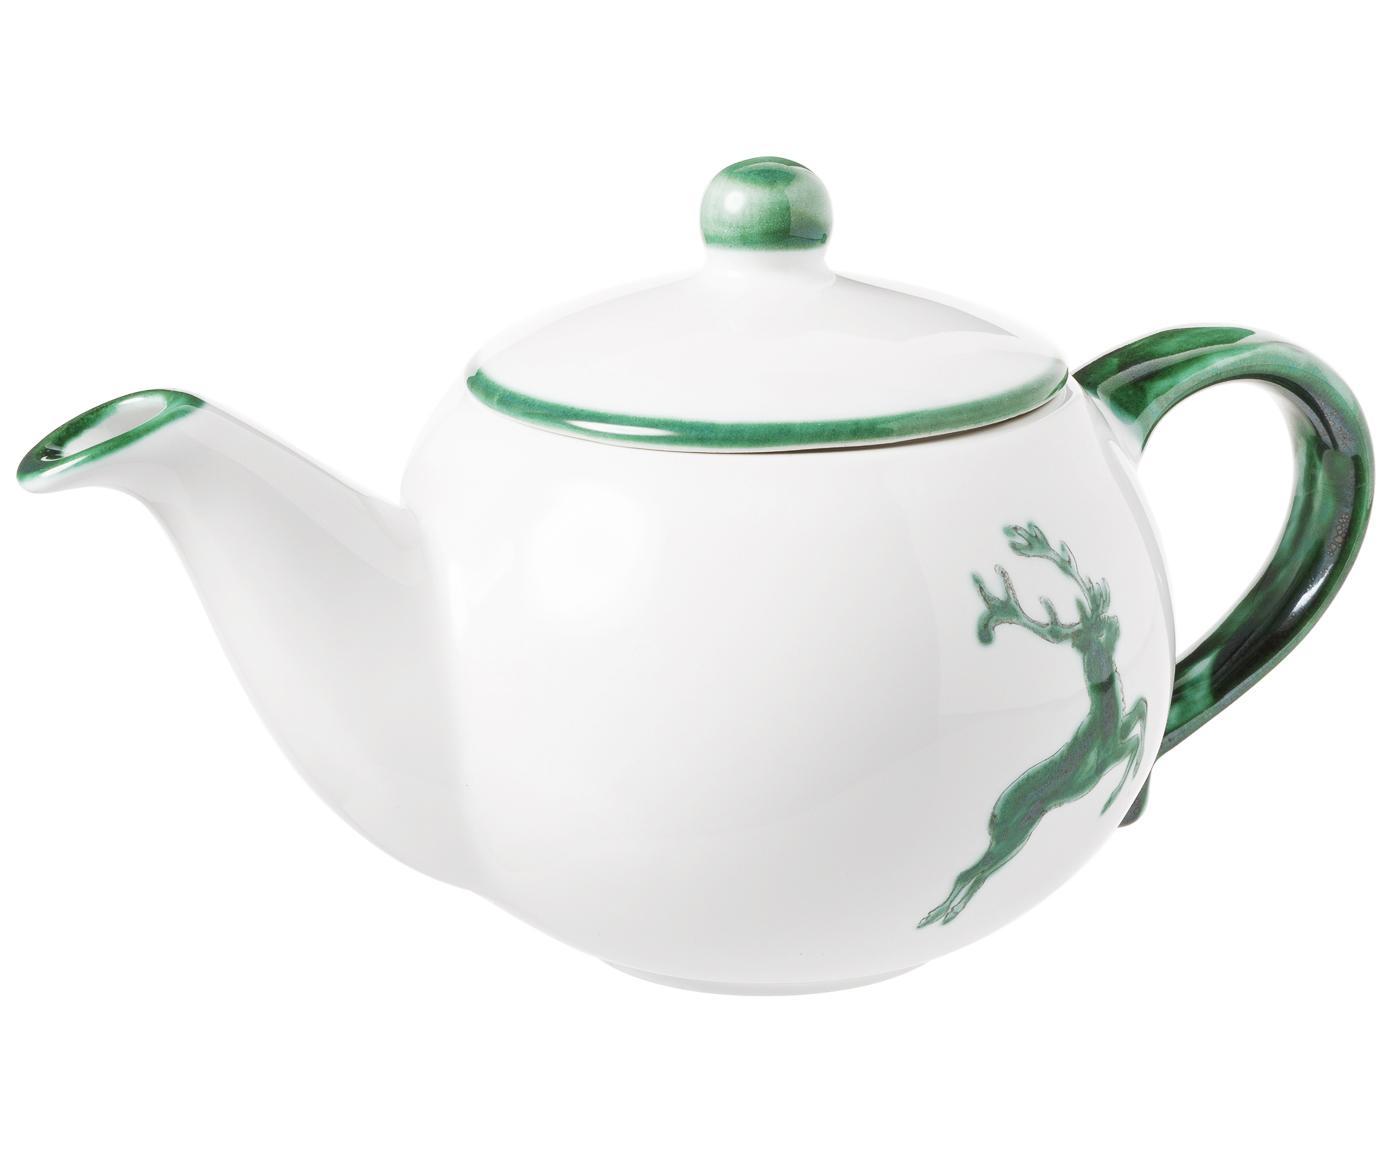 Teekanne Classic Grüner Hirsch, Keramik, Grün,Weiß, 500 ml